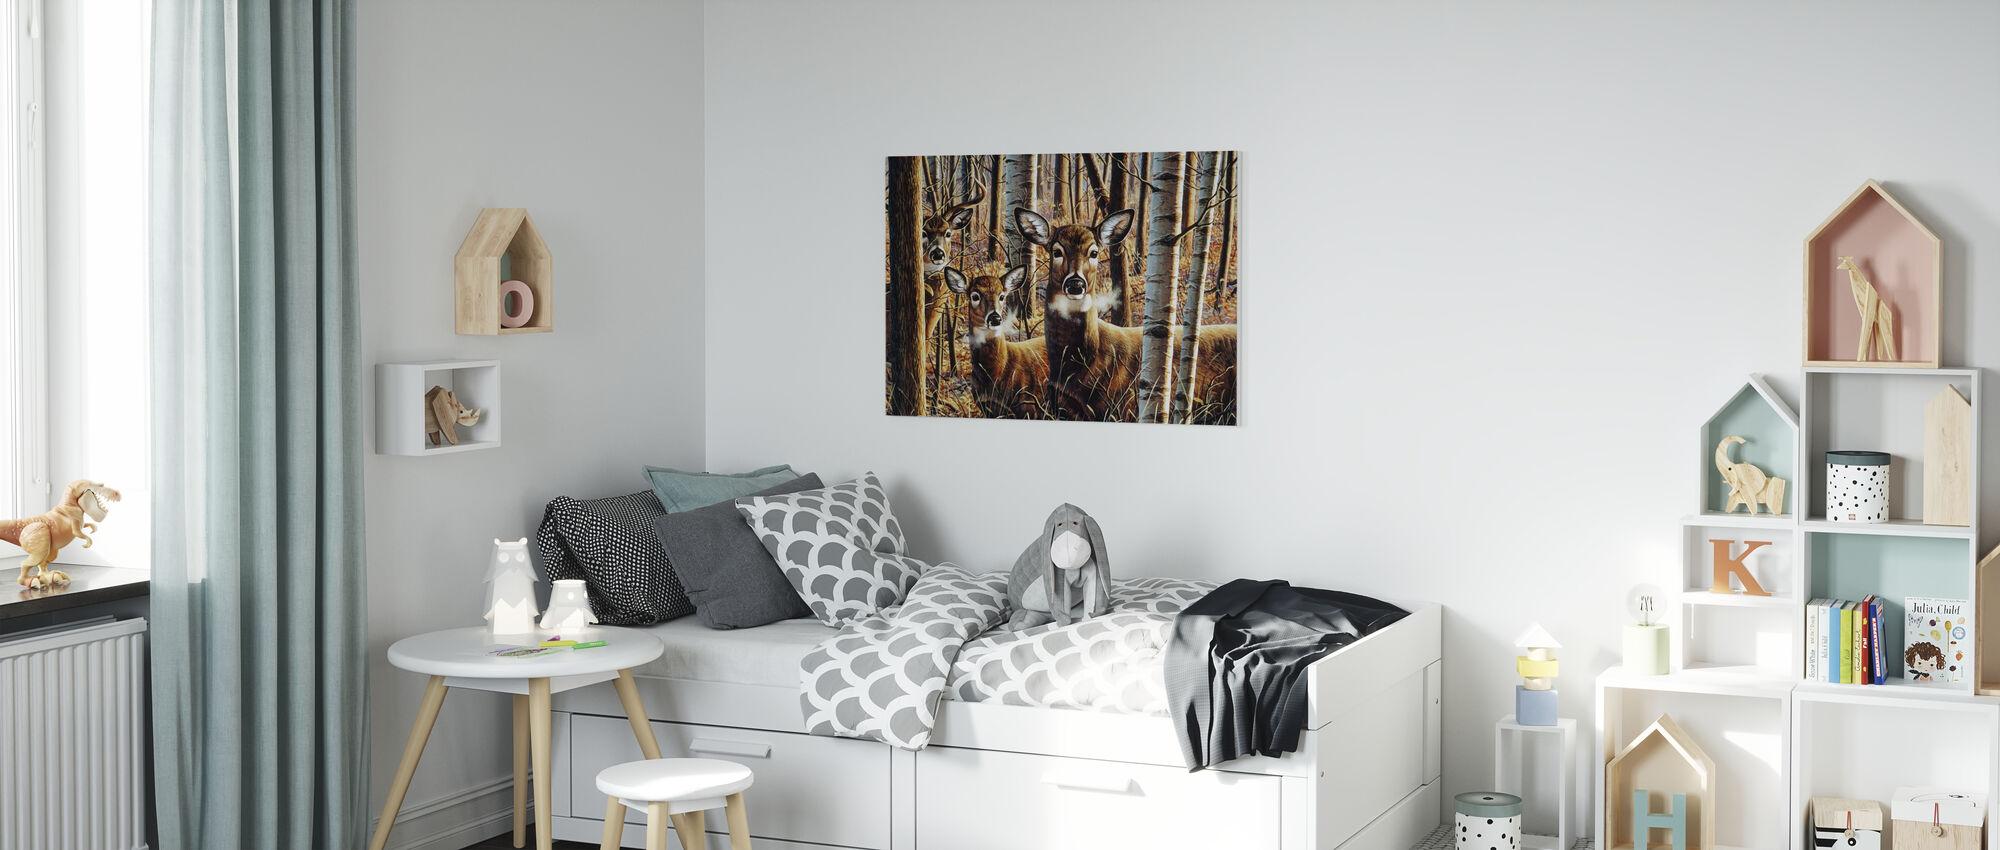 Whitetails voor Bradford - Canvas print - Kinderkamer